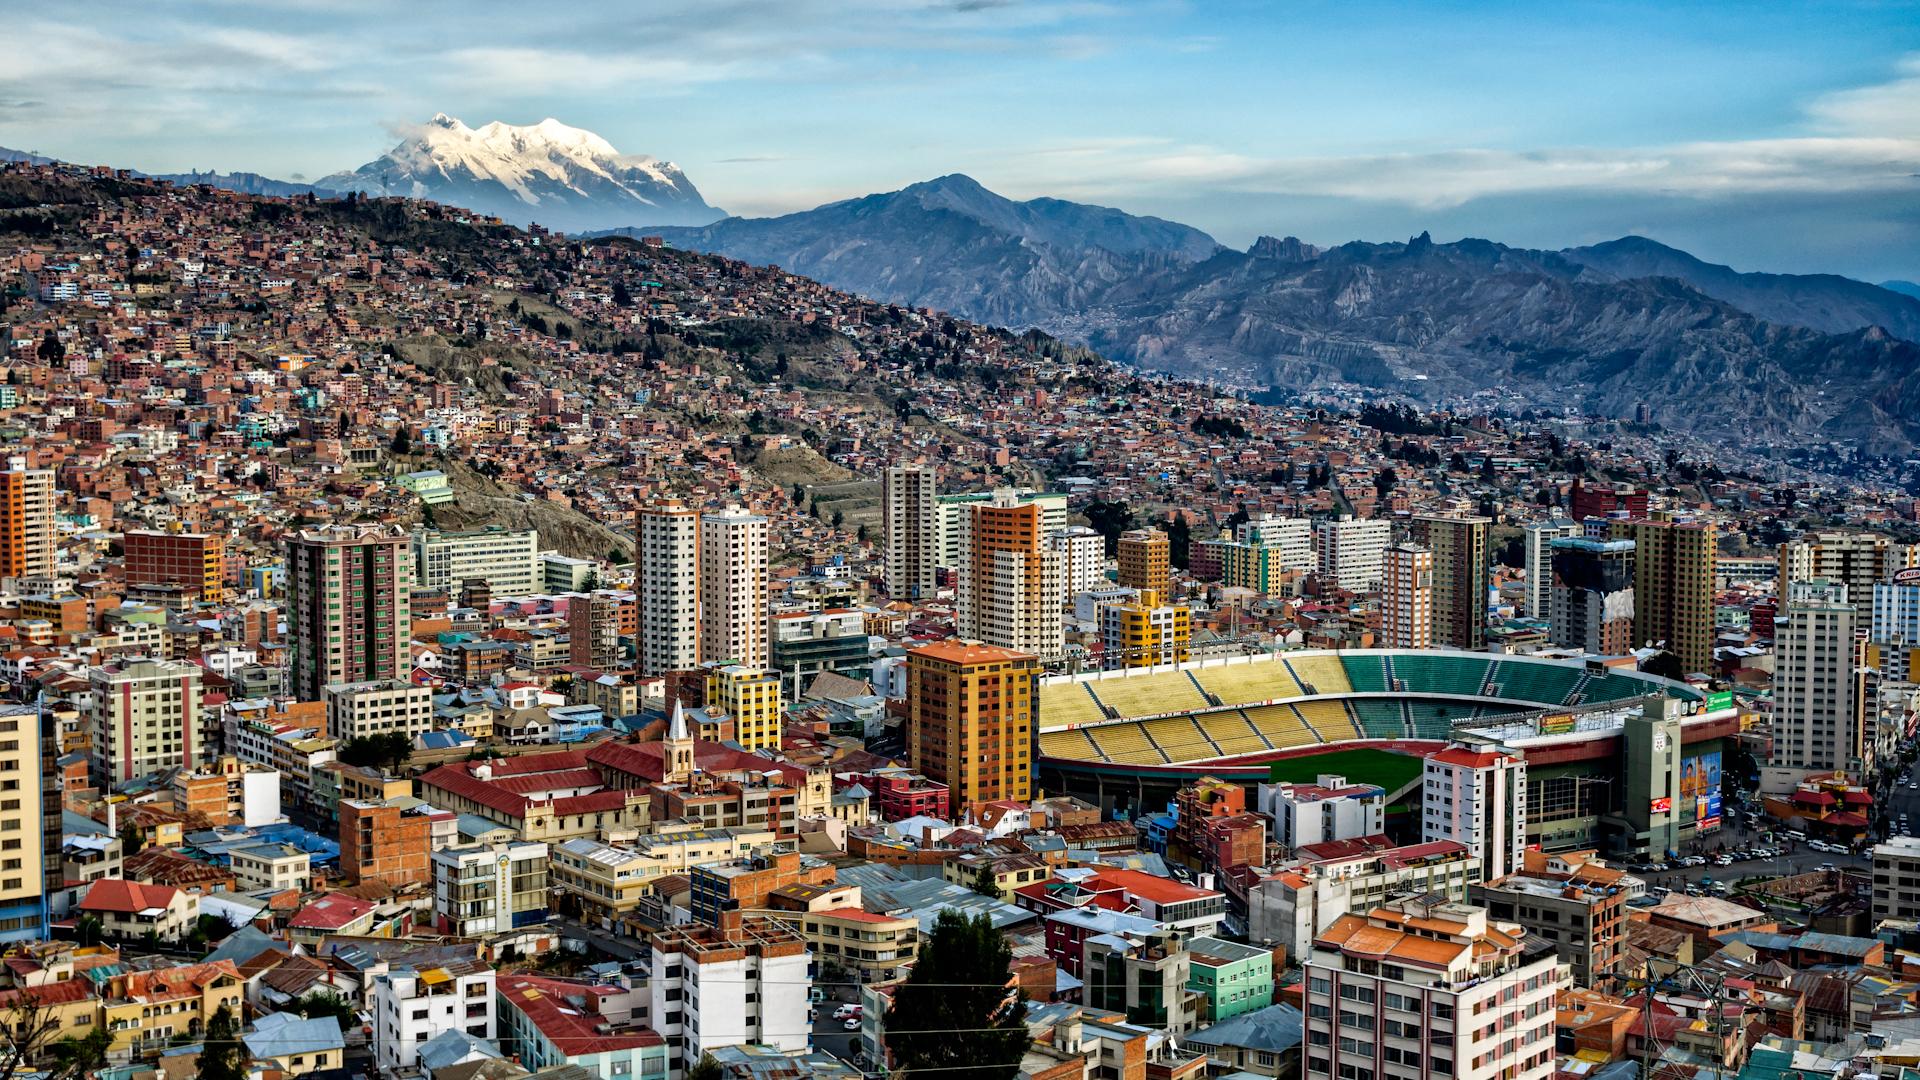 PunjabKesari, La Paz Bolivia